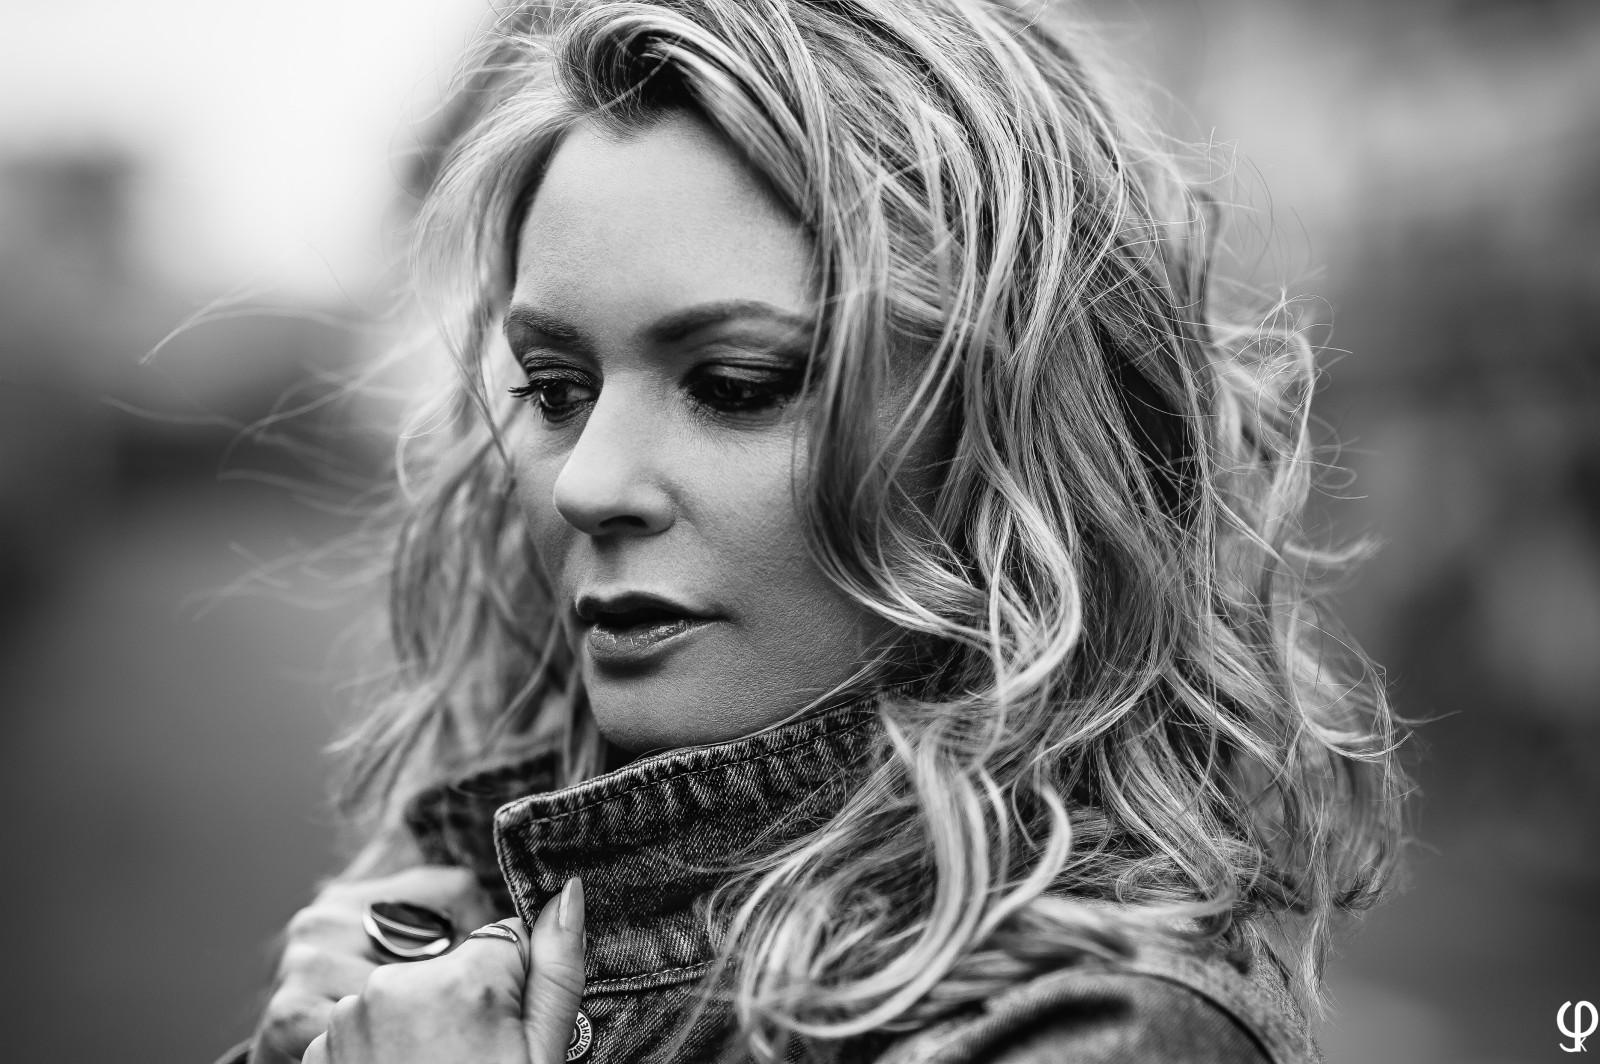 Wallpaper : face, contrast, model, blonde, long hair, urban, Nikon